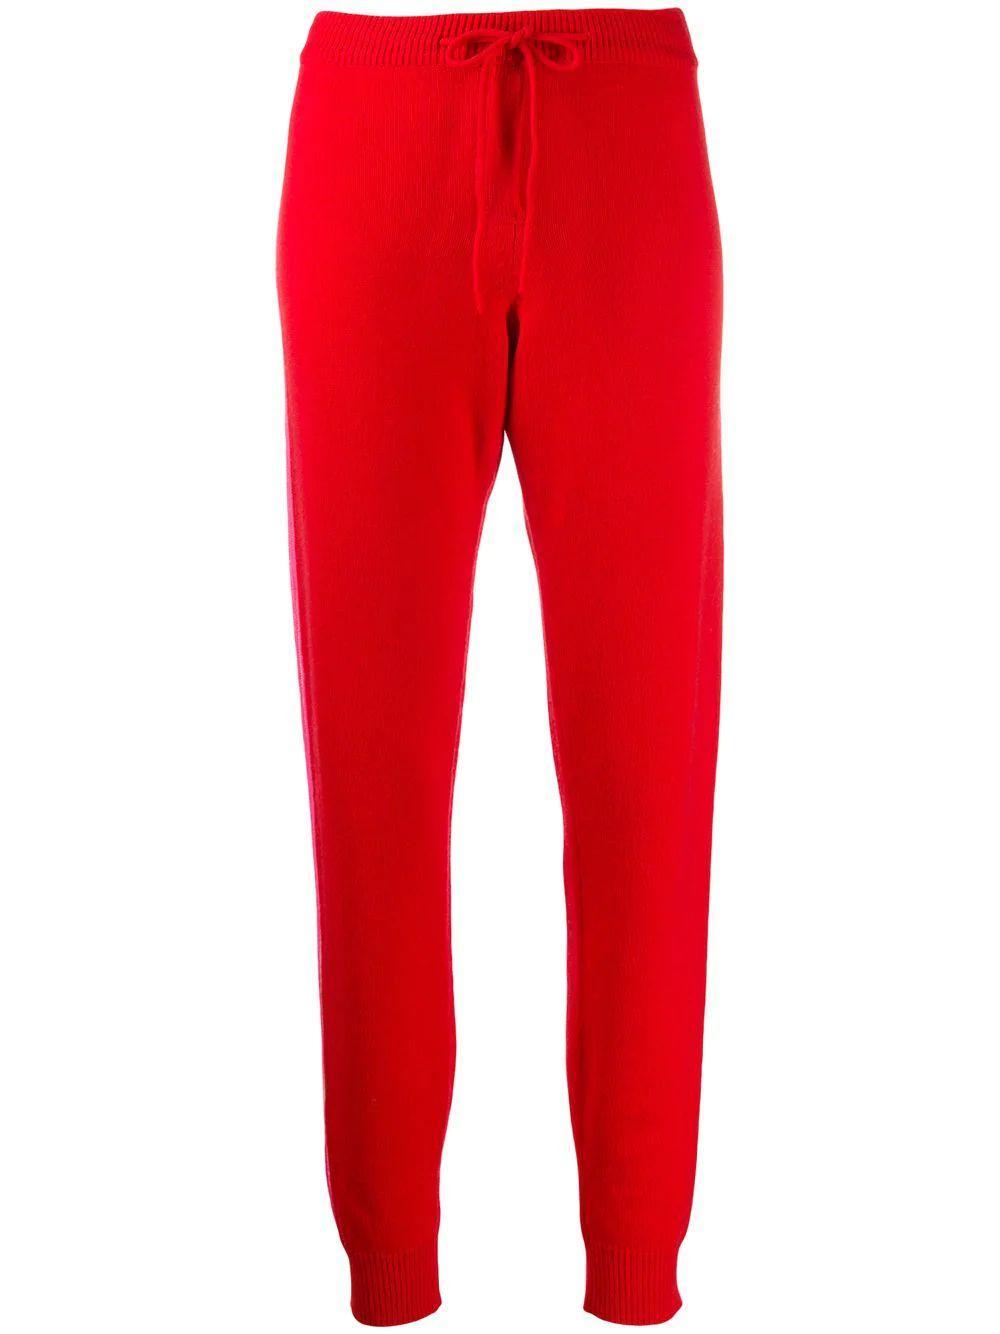 Ripple Track Pants Item # KQ108